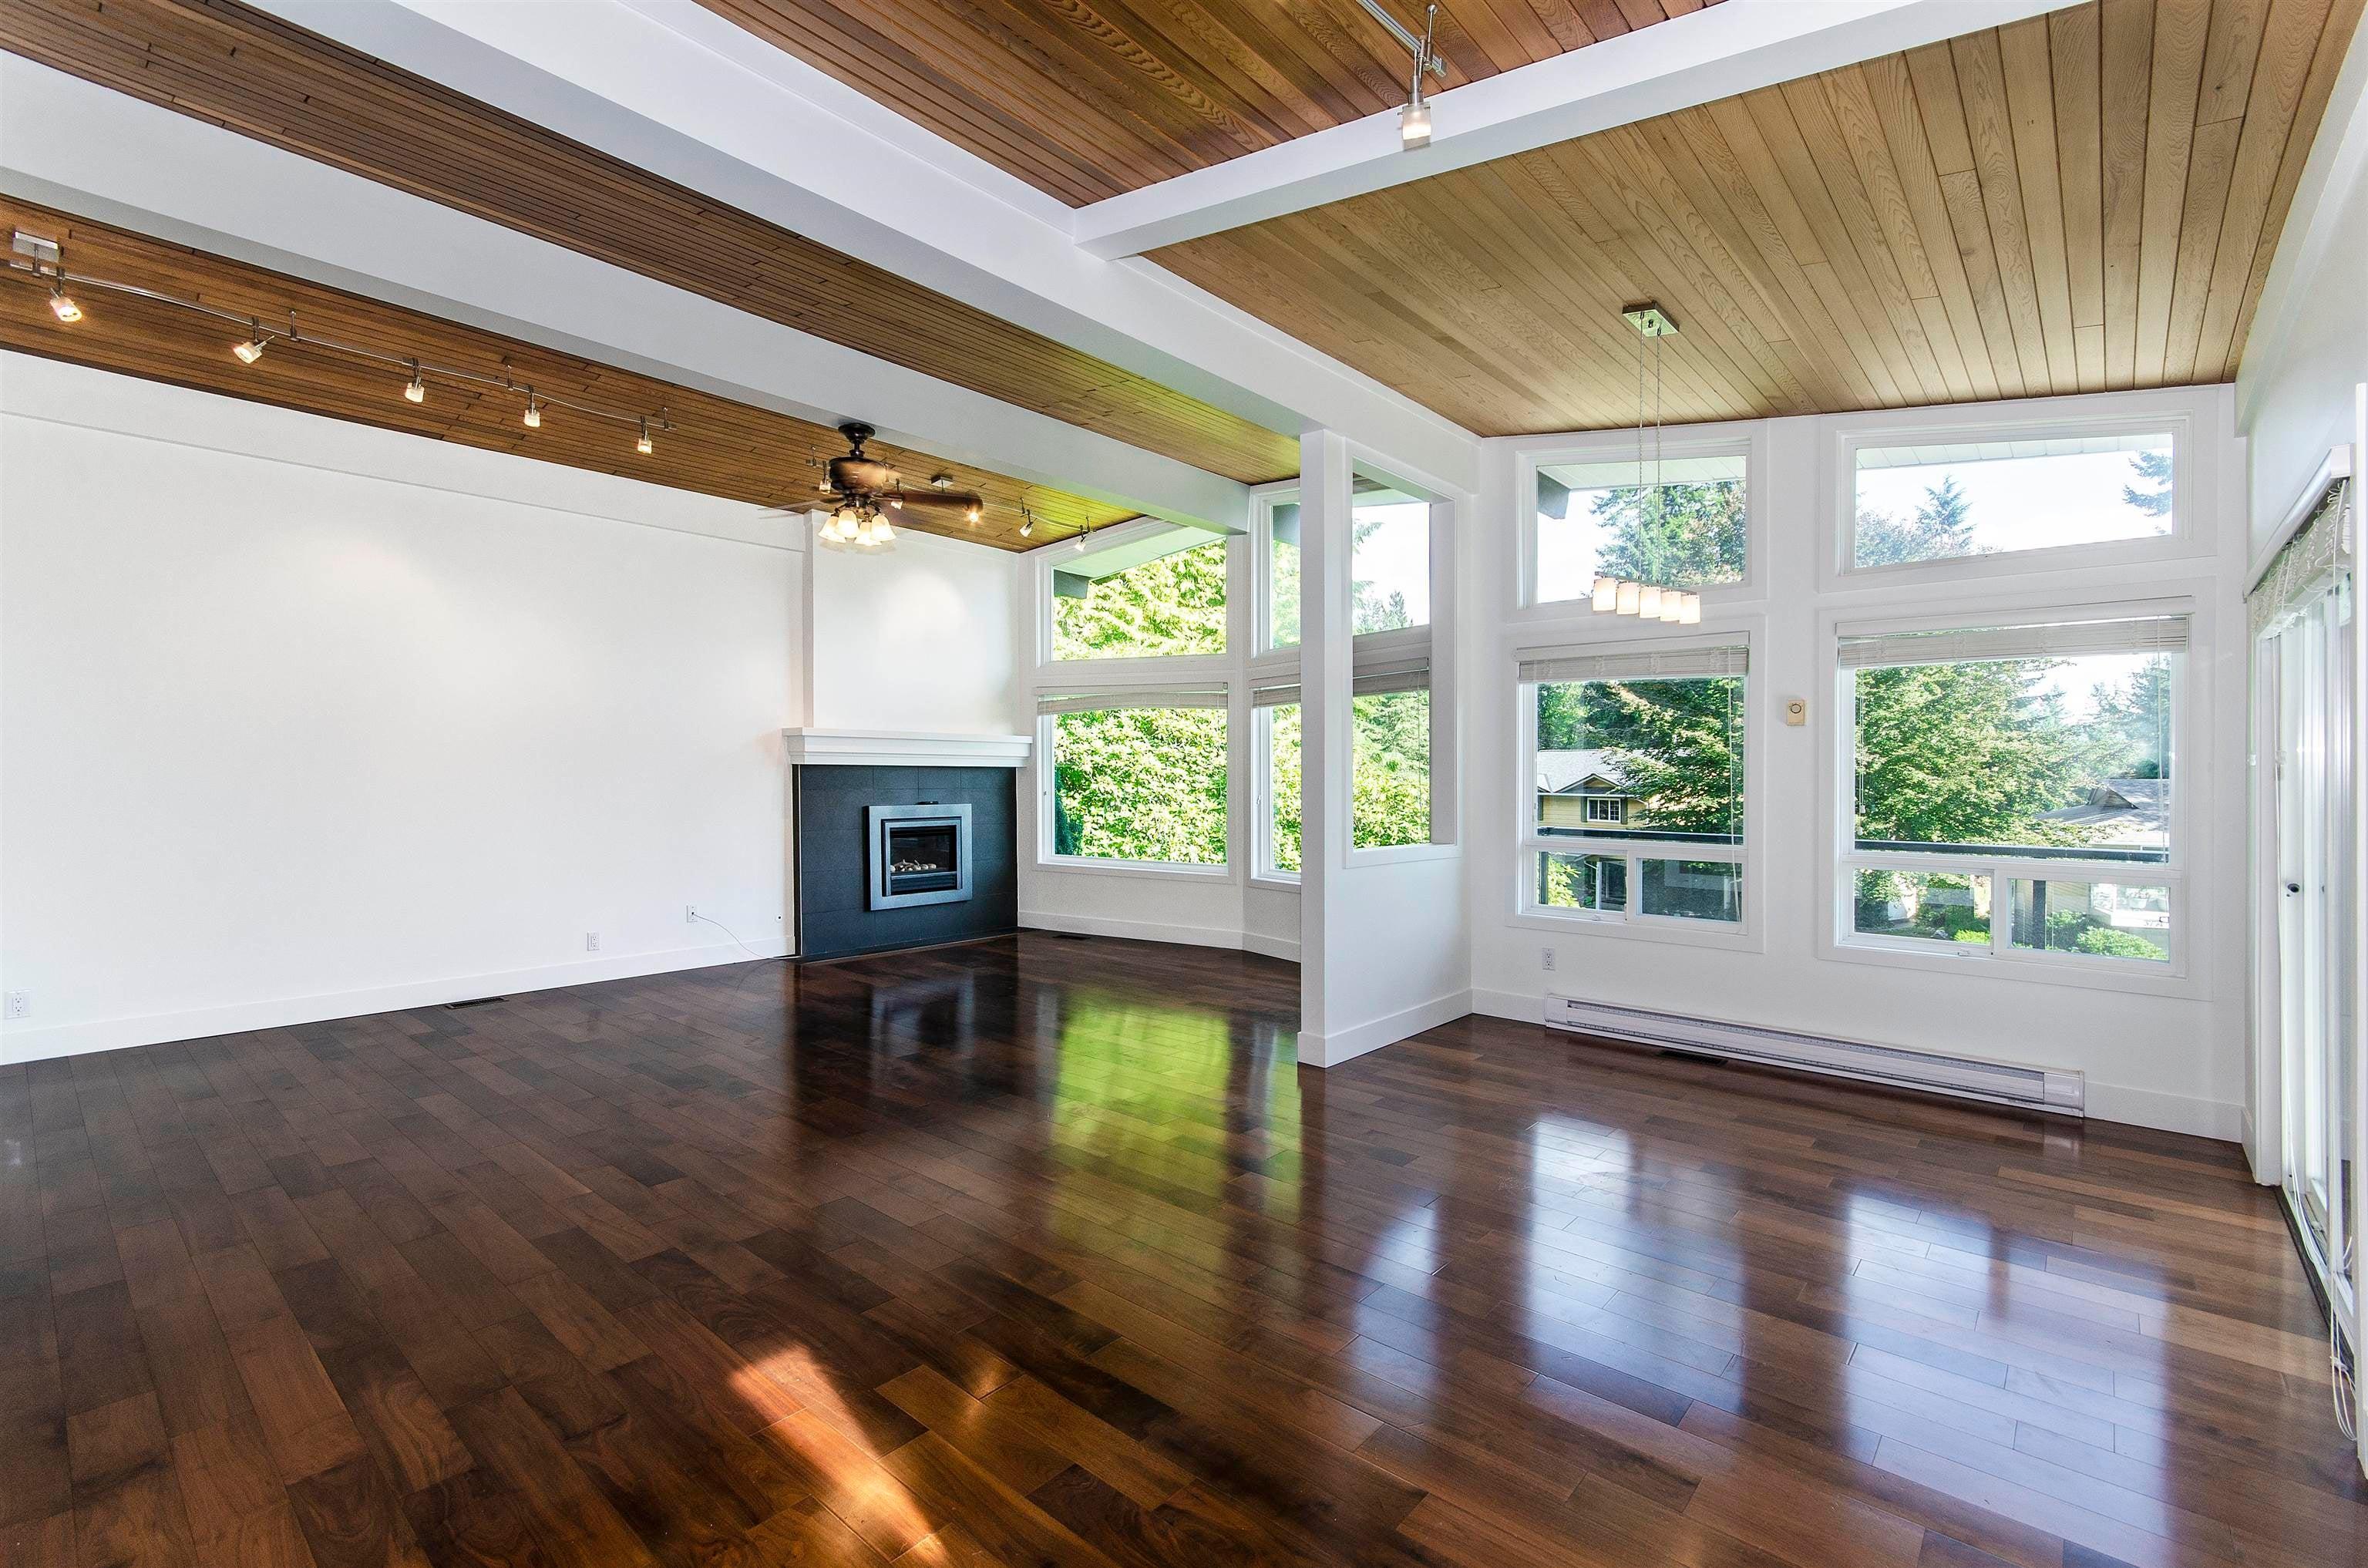 3785 REGENT AVENUE - Upper Lonsdale House/Single Family for sale, 4 Bedrooms (R2617648) - #5